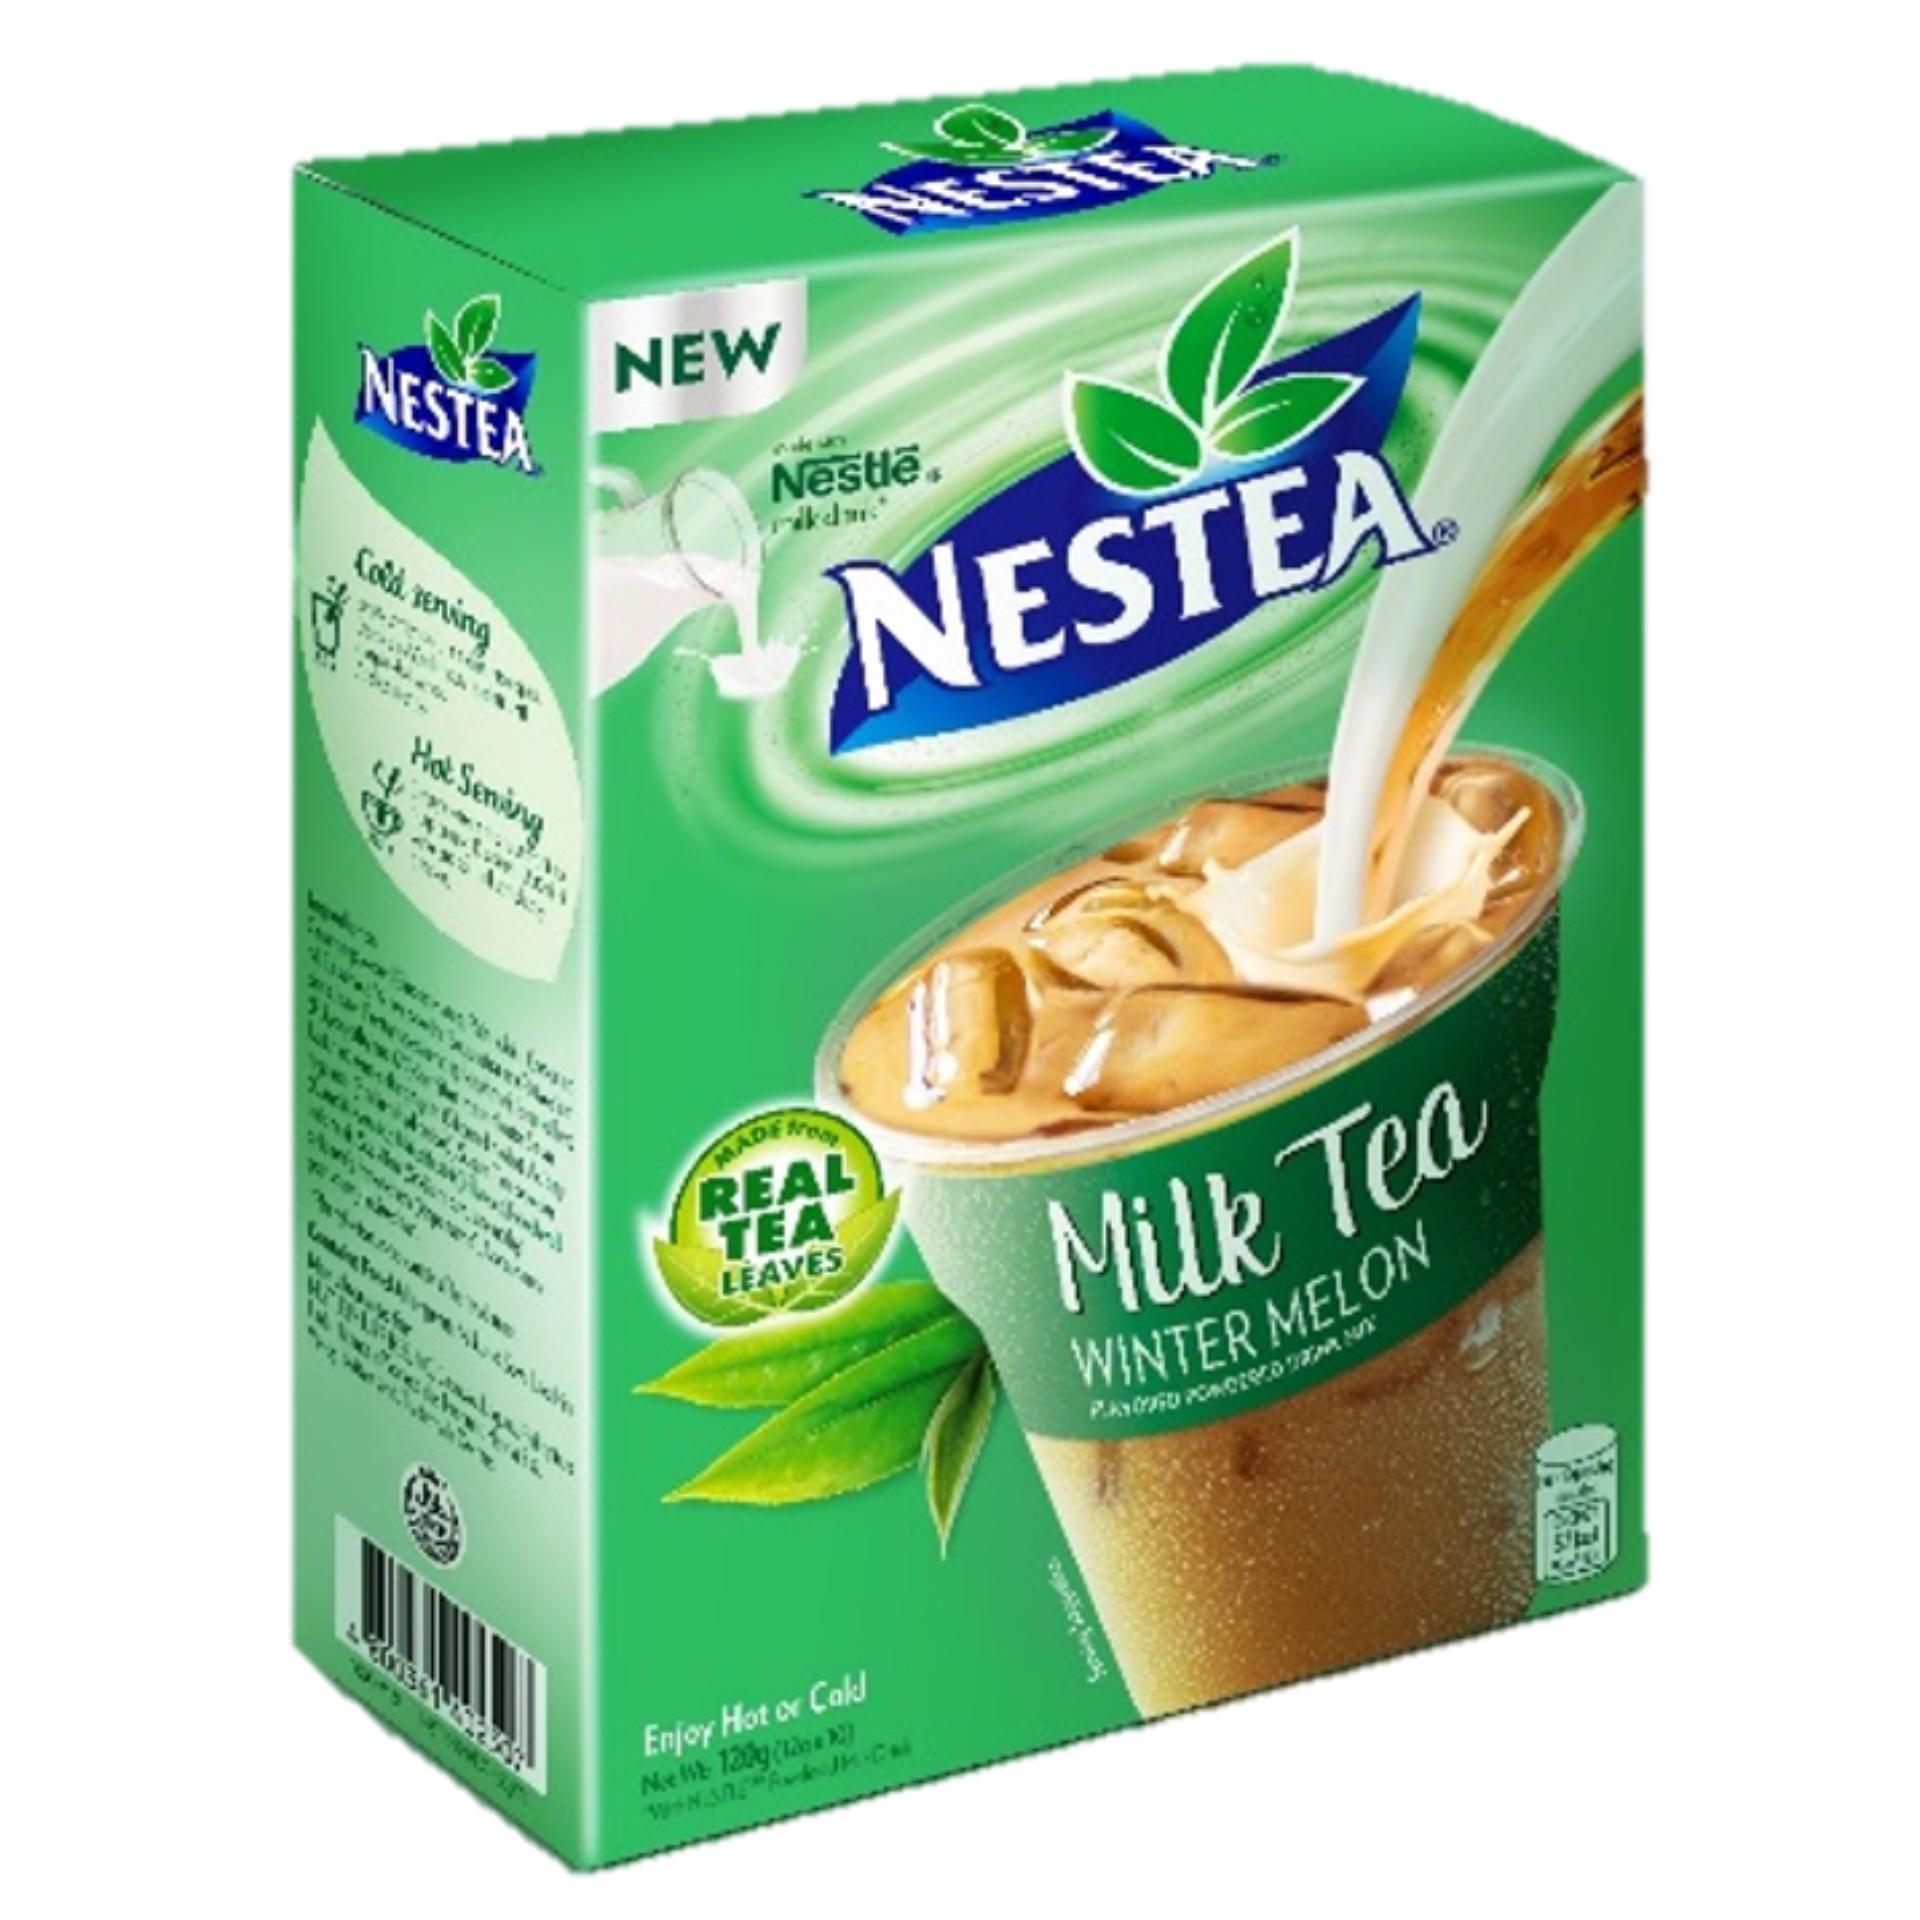 Nestea Philippines Price List Tea Powder Juice Drink For Lemon Milk Wintermelon 12g Pack Of 10